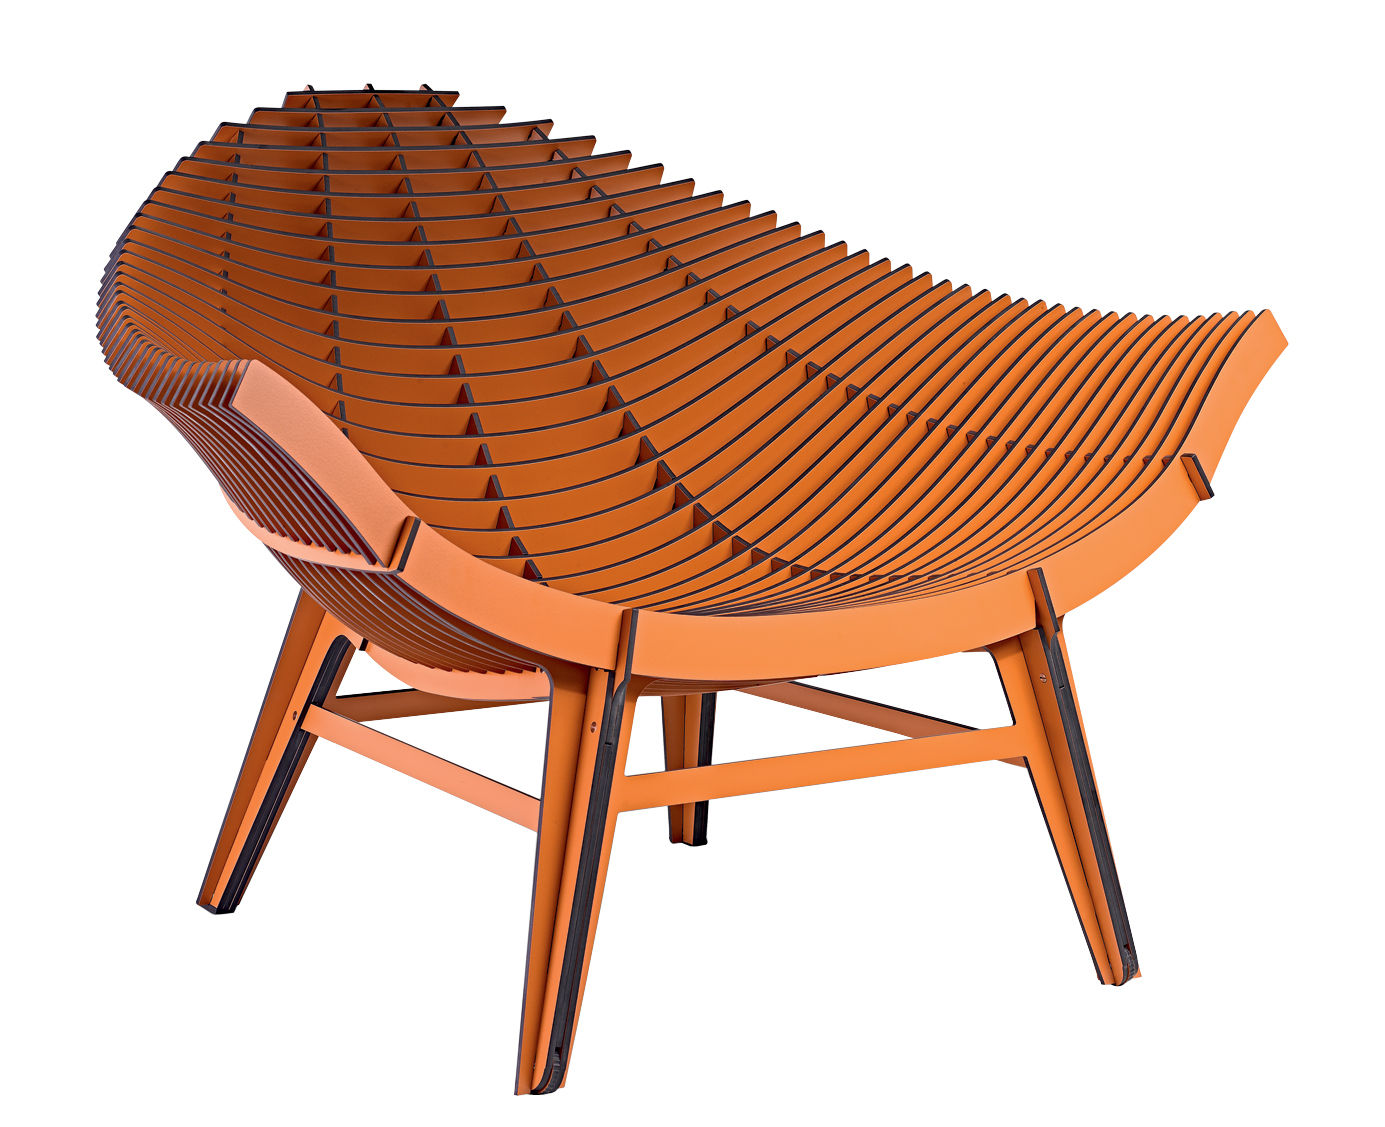 fauteuil bas manta stratifi int rieur ext rieur camel ibride. Black Bedroom Furniture Sets. Home Design Ideas